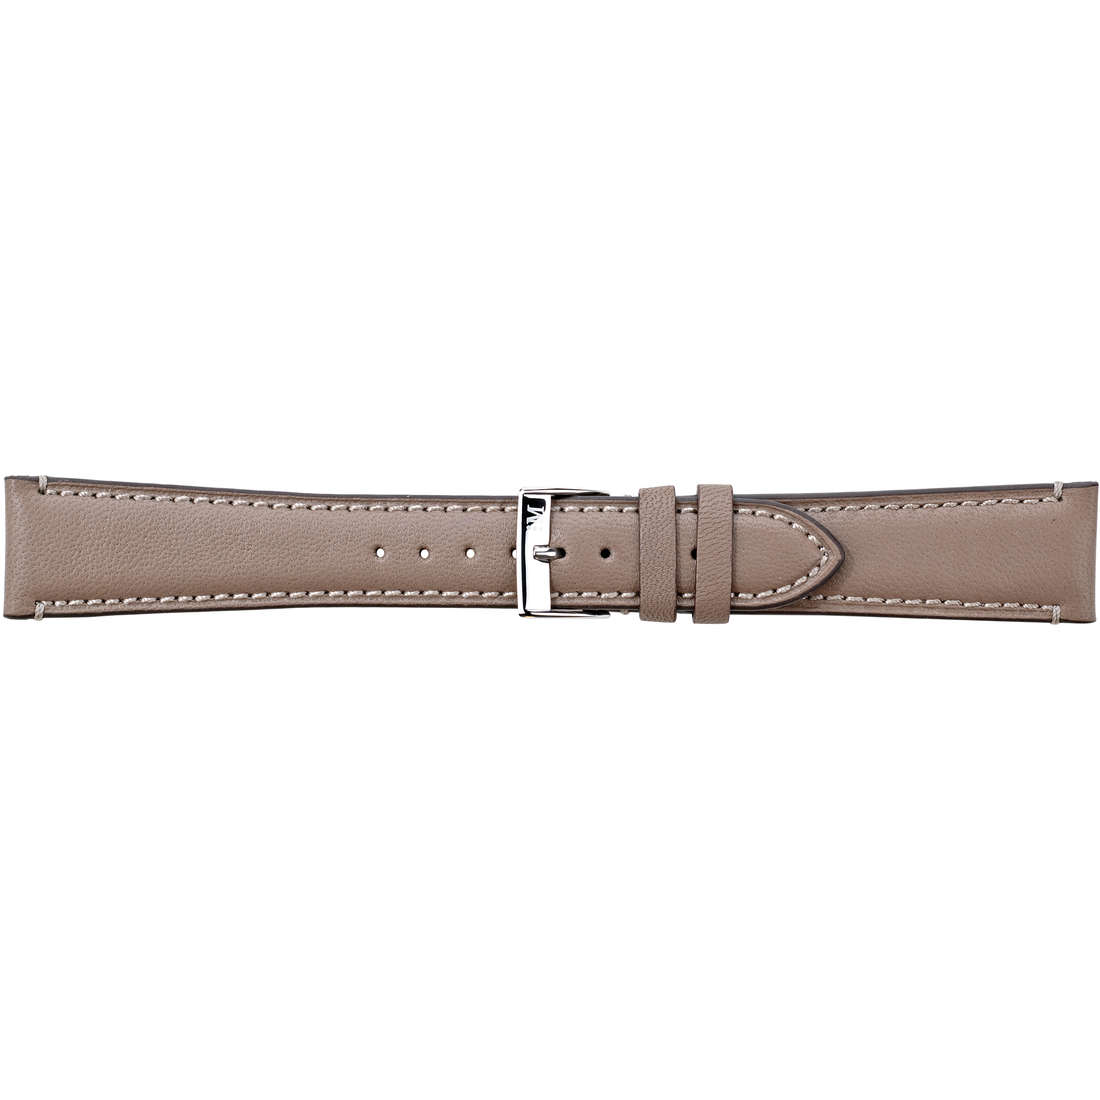 watch watch bands watch straps man Morellato Manufatti A01X3495006029CR14